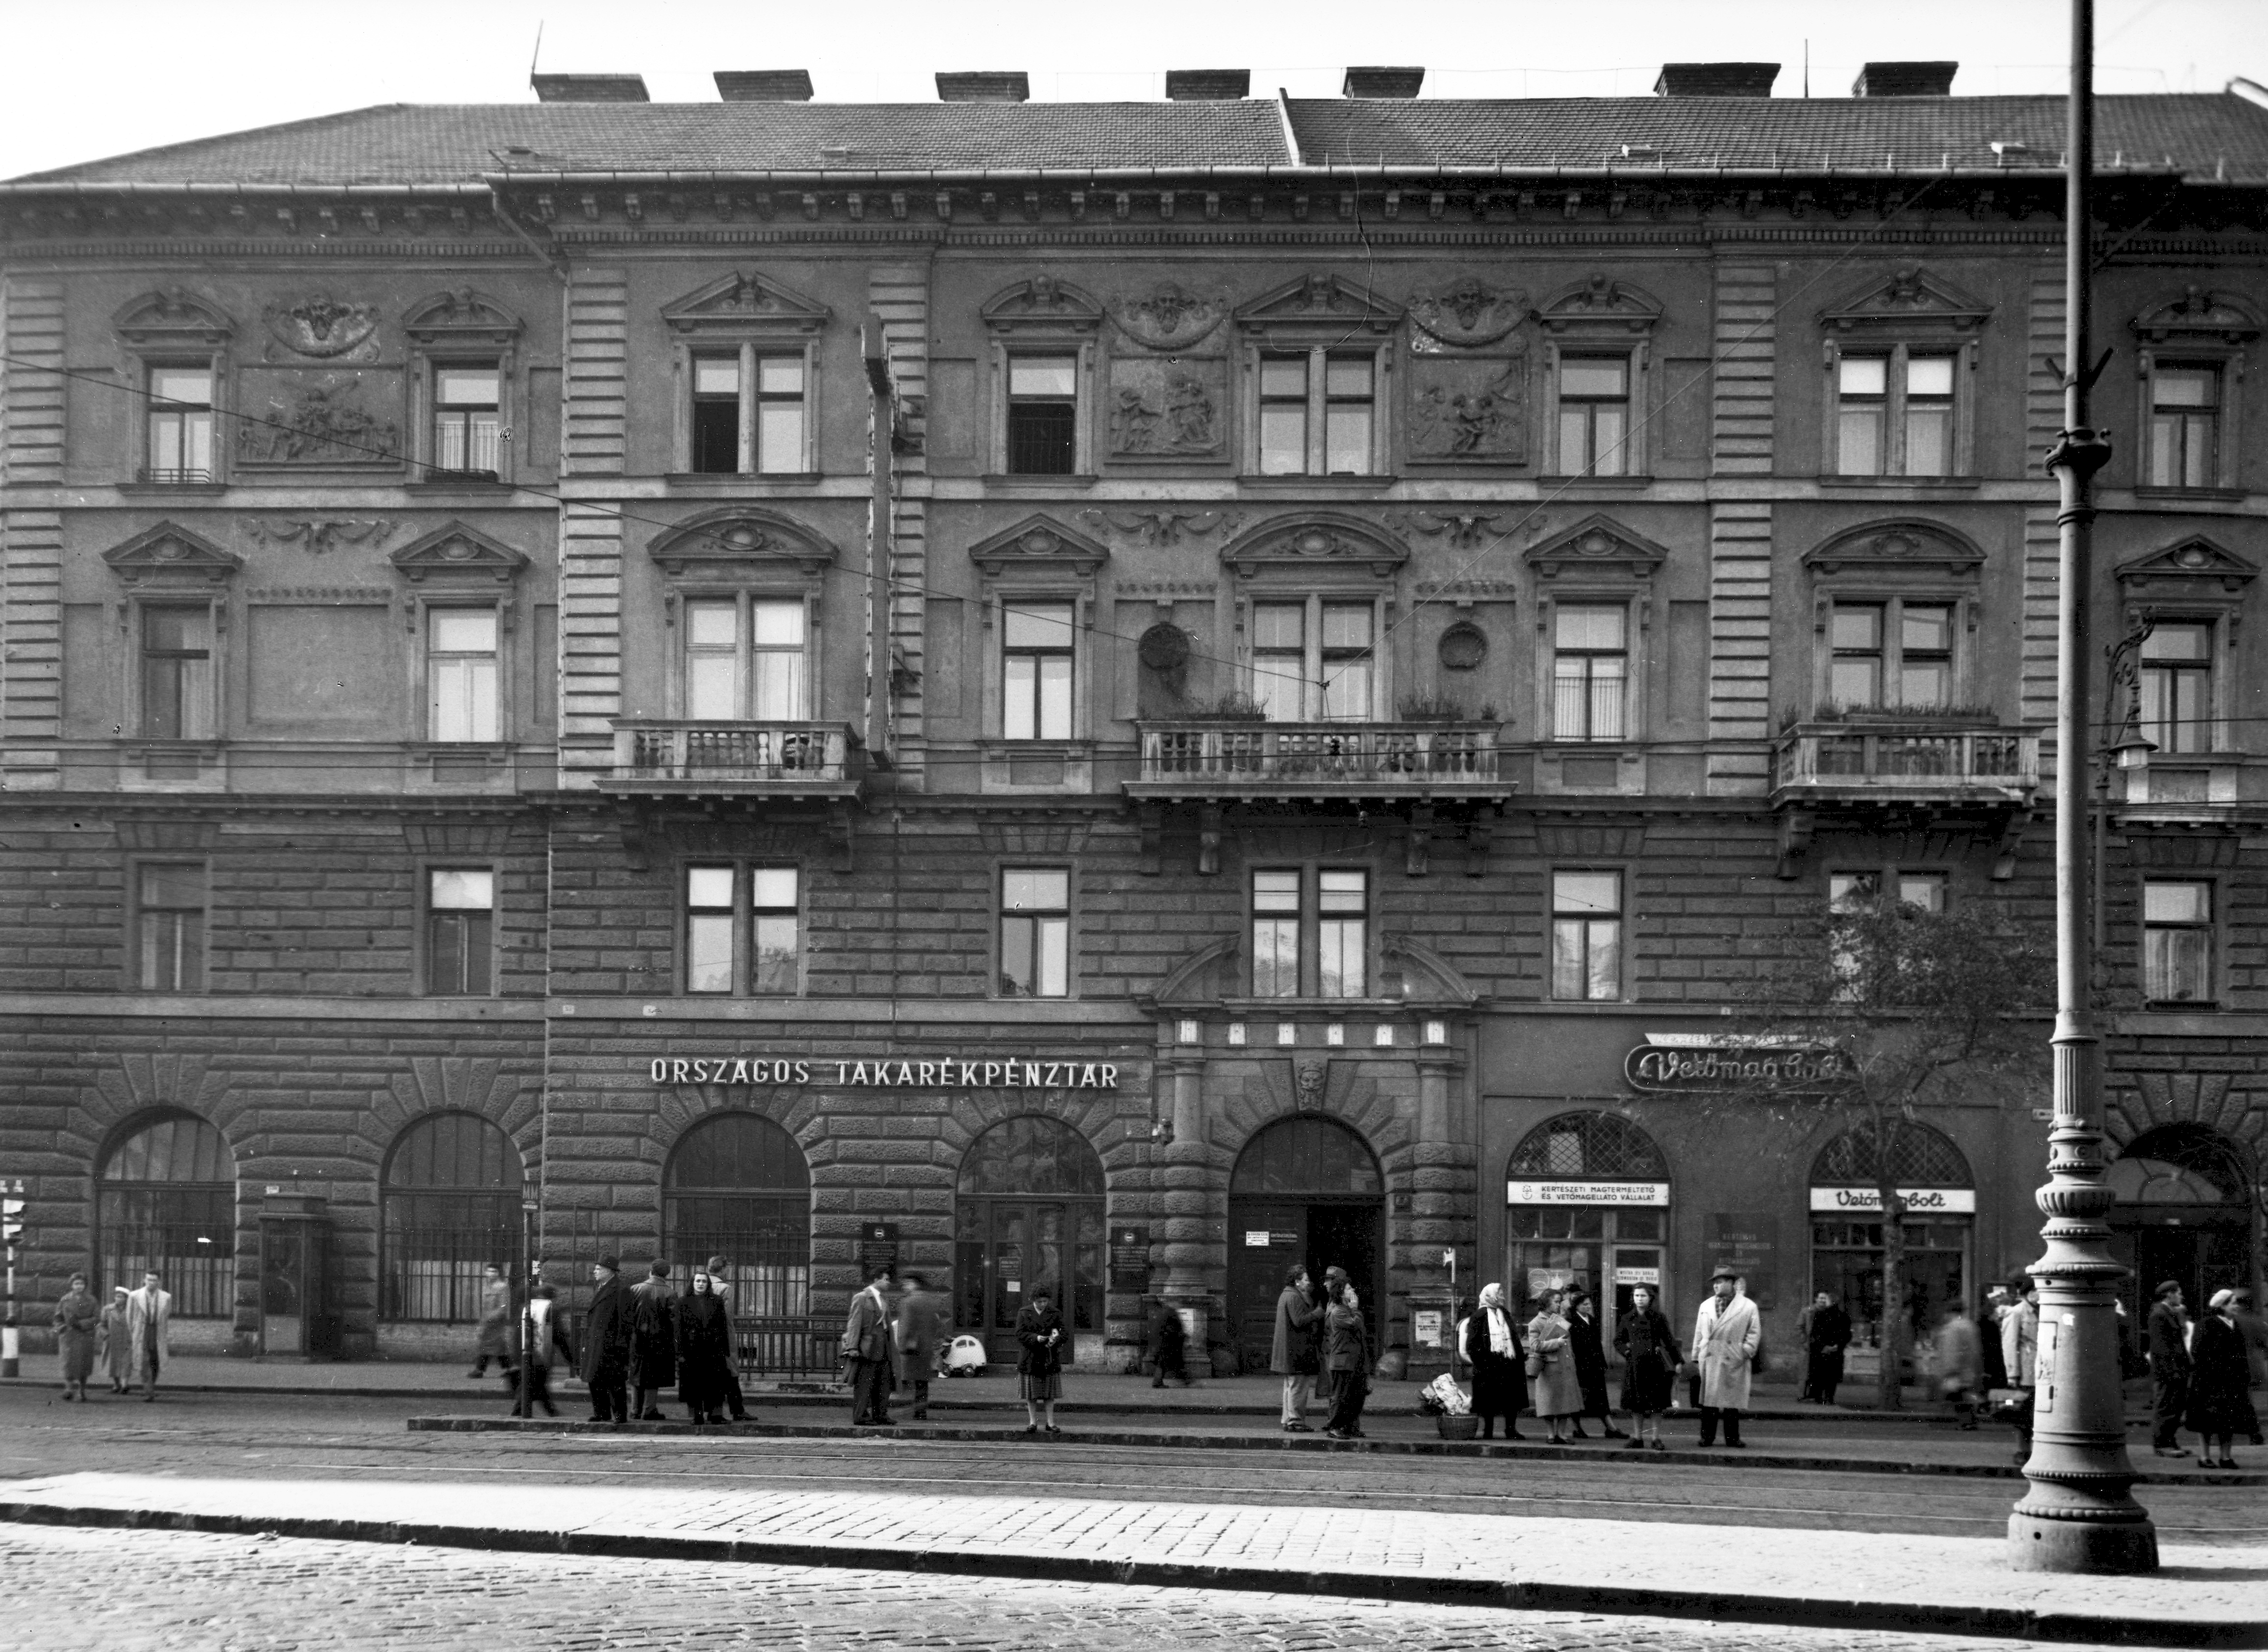 Fájl:Nyugati (Marx) tér 9., 1958 Budapest - Fortepan ...